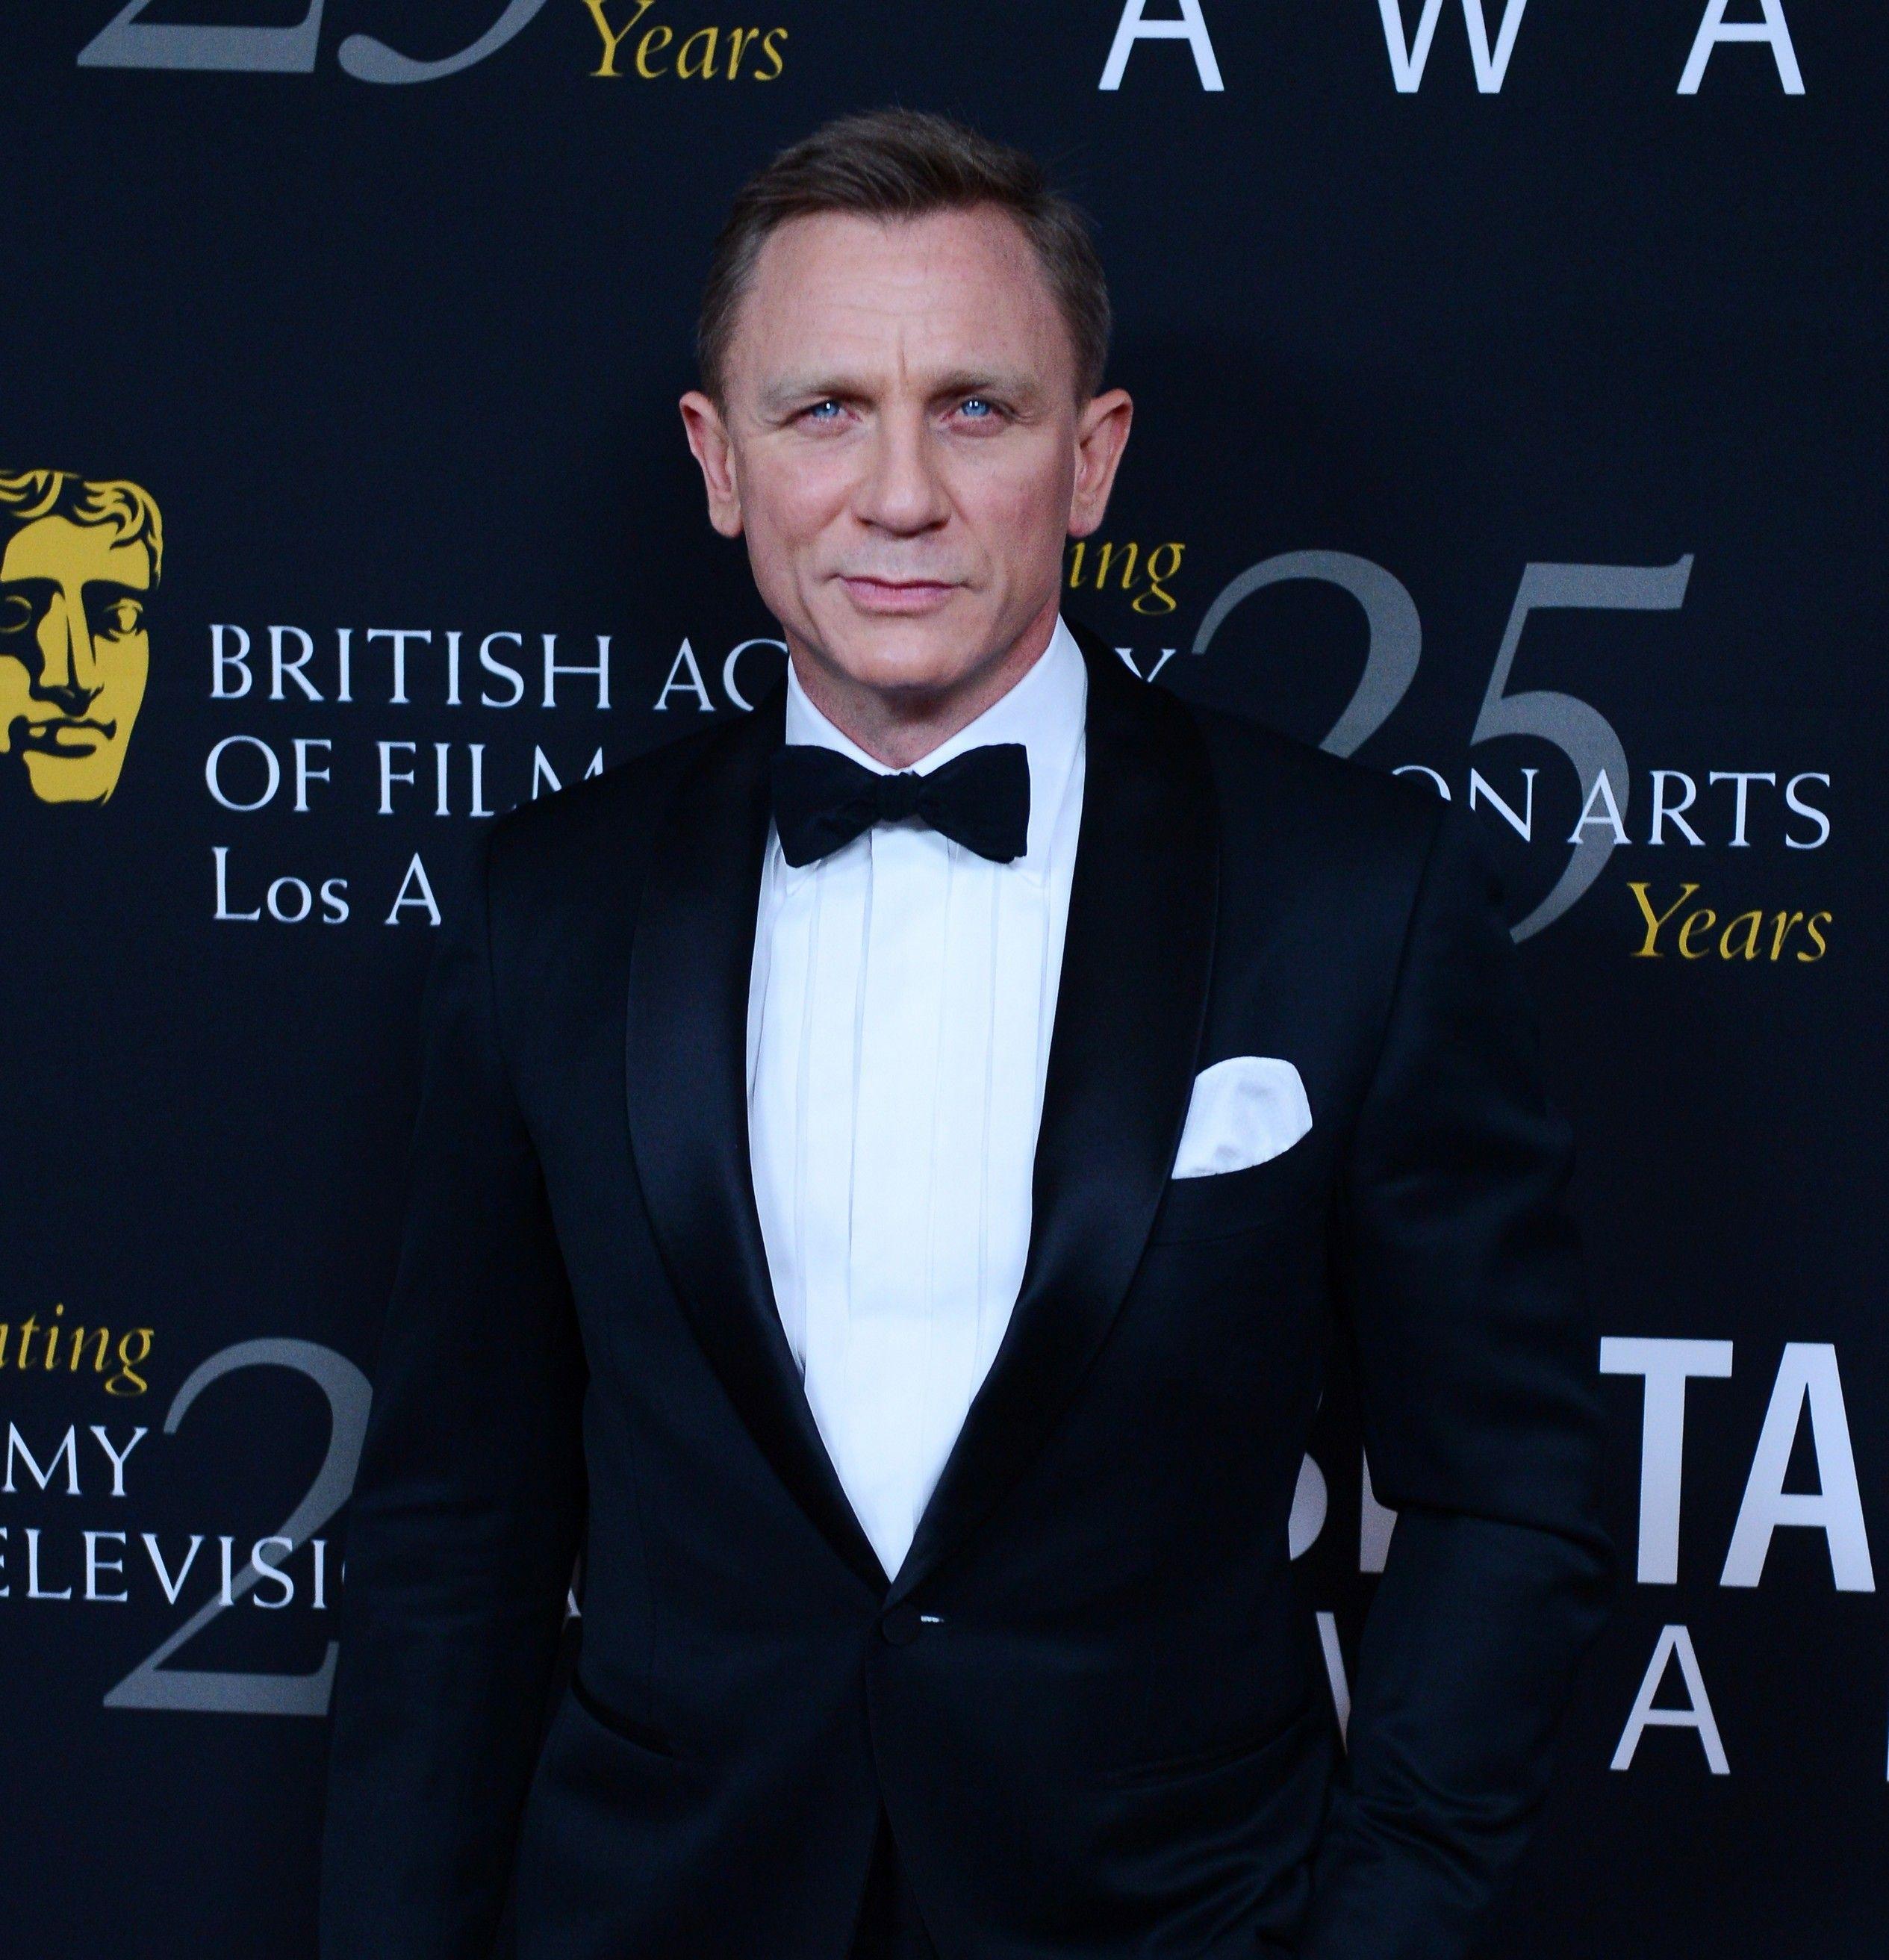 BAFTA_LA_Britannia_Awards_039.jpg (2530×2625)